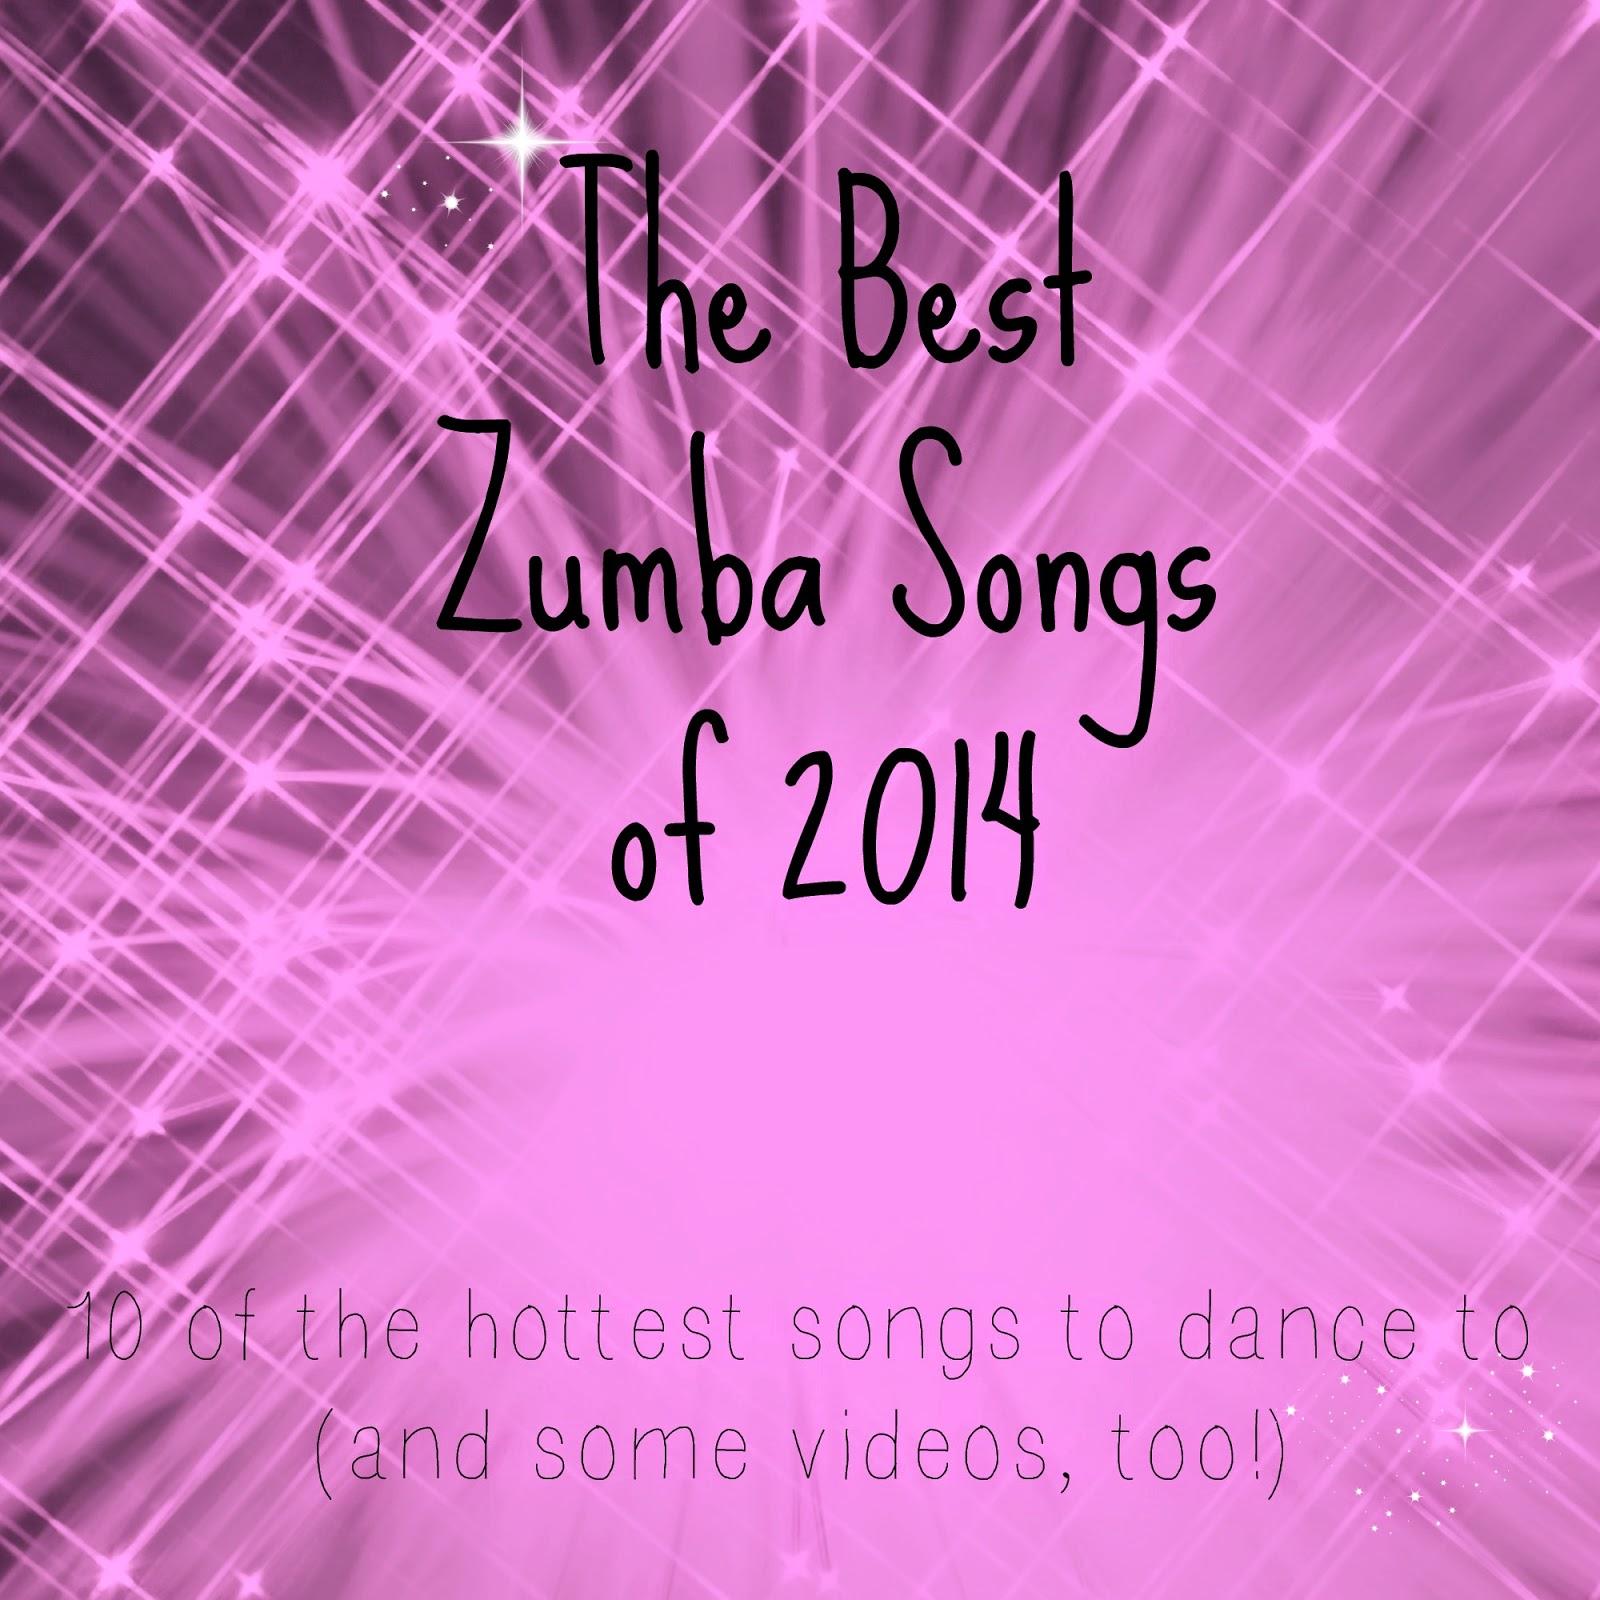 Zumba Song List: Hot Songs of 2014 - Razorback Britt